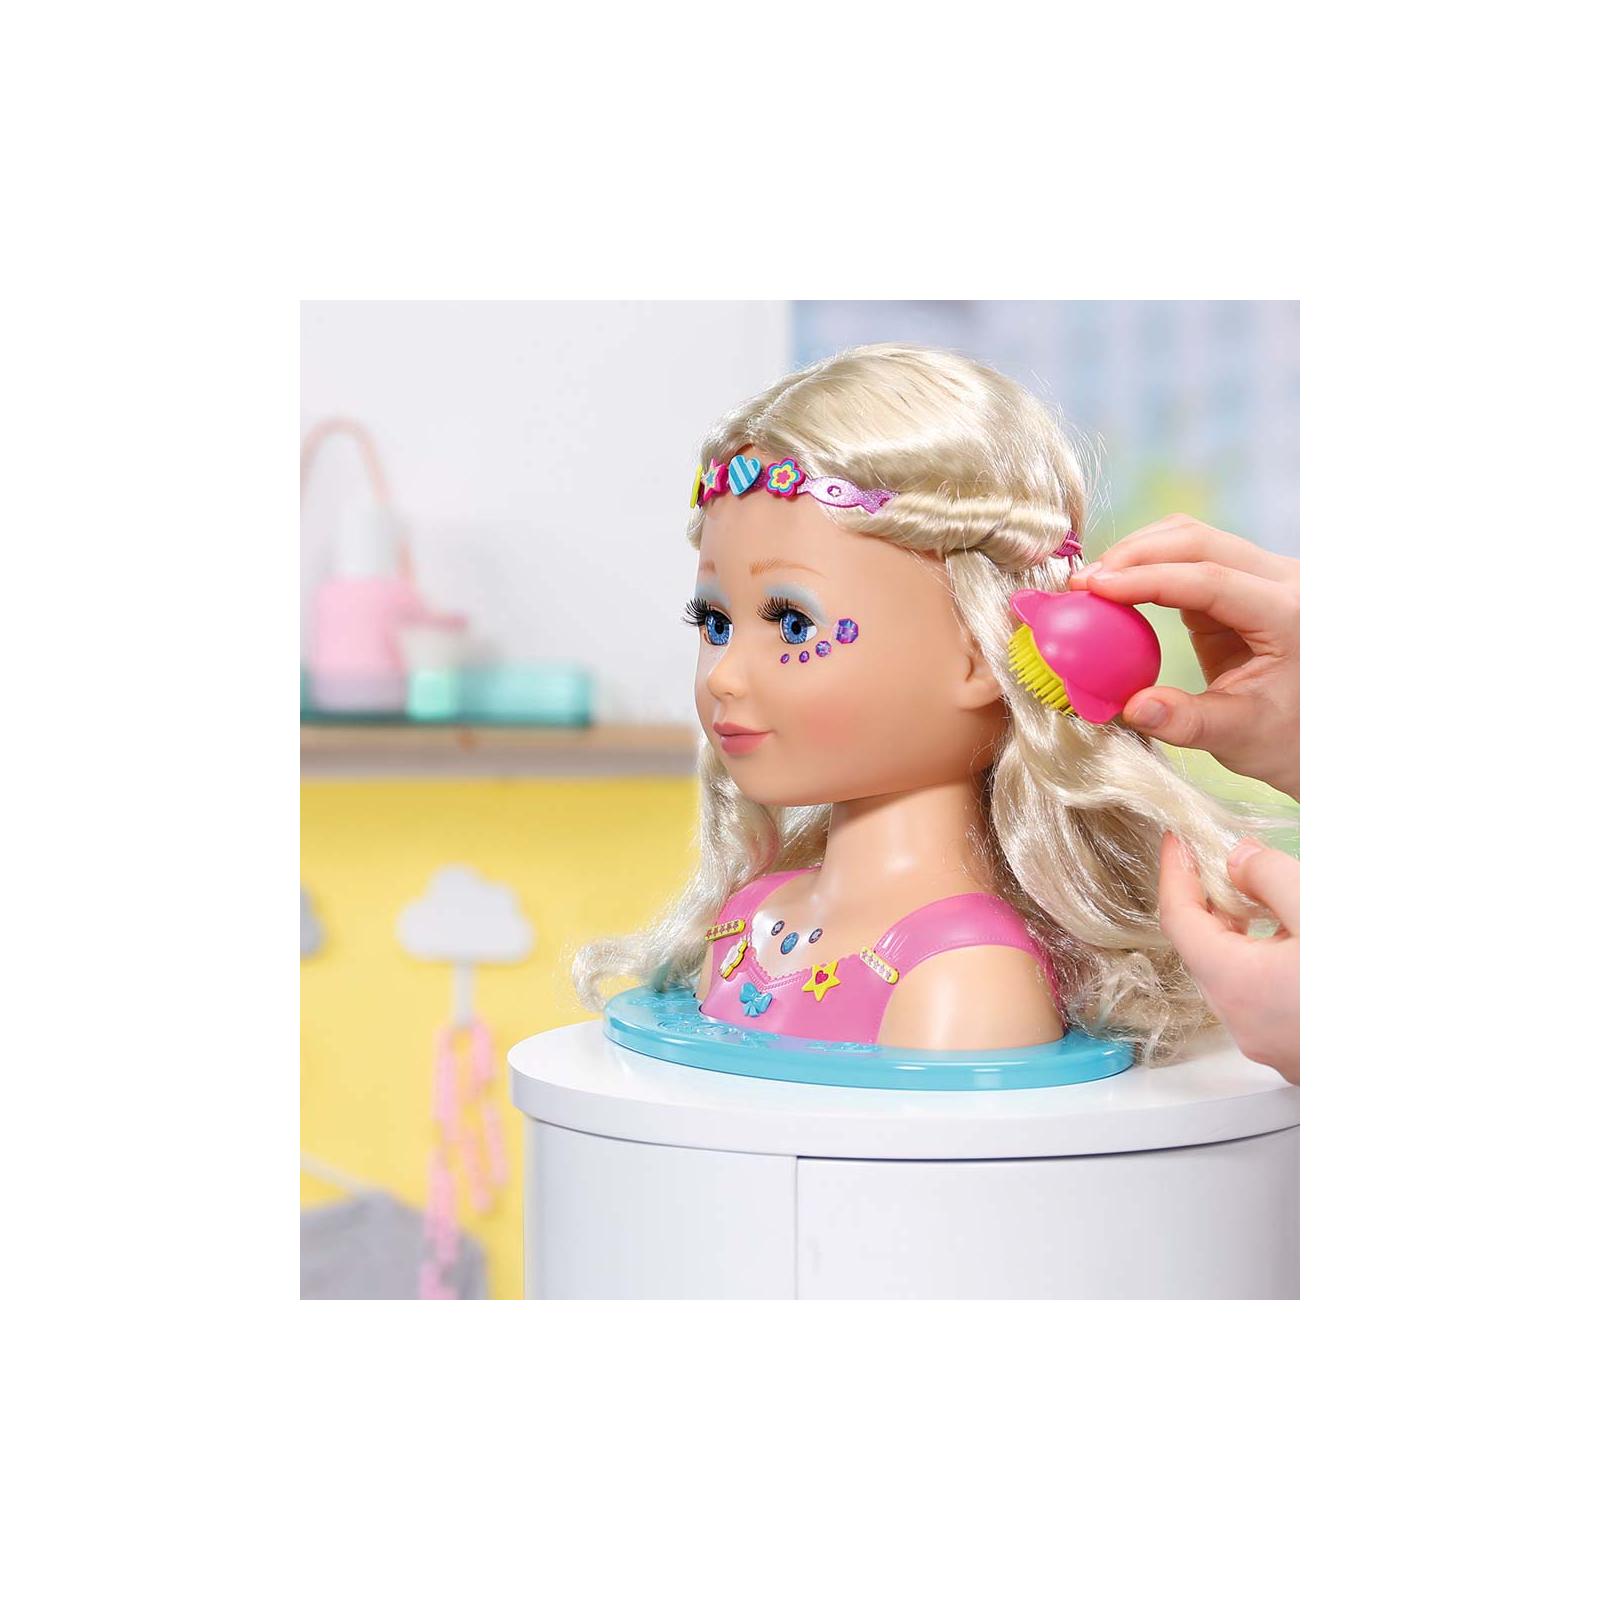 Кукла Zapf манекен My Model Сестричка с аксессуарами (824788) изображение 9